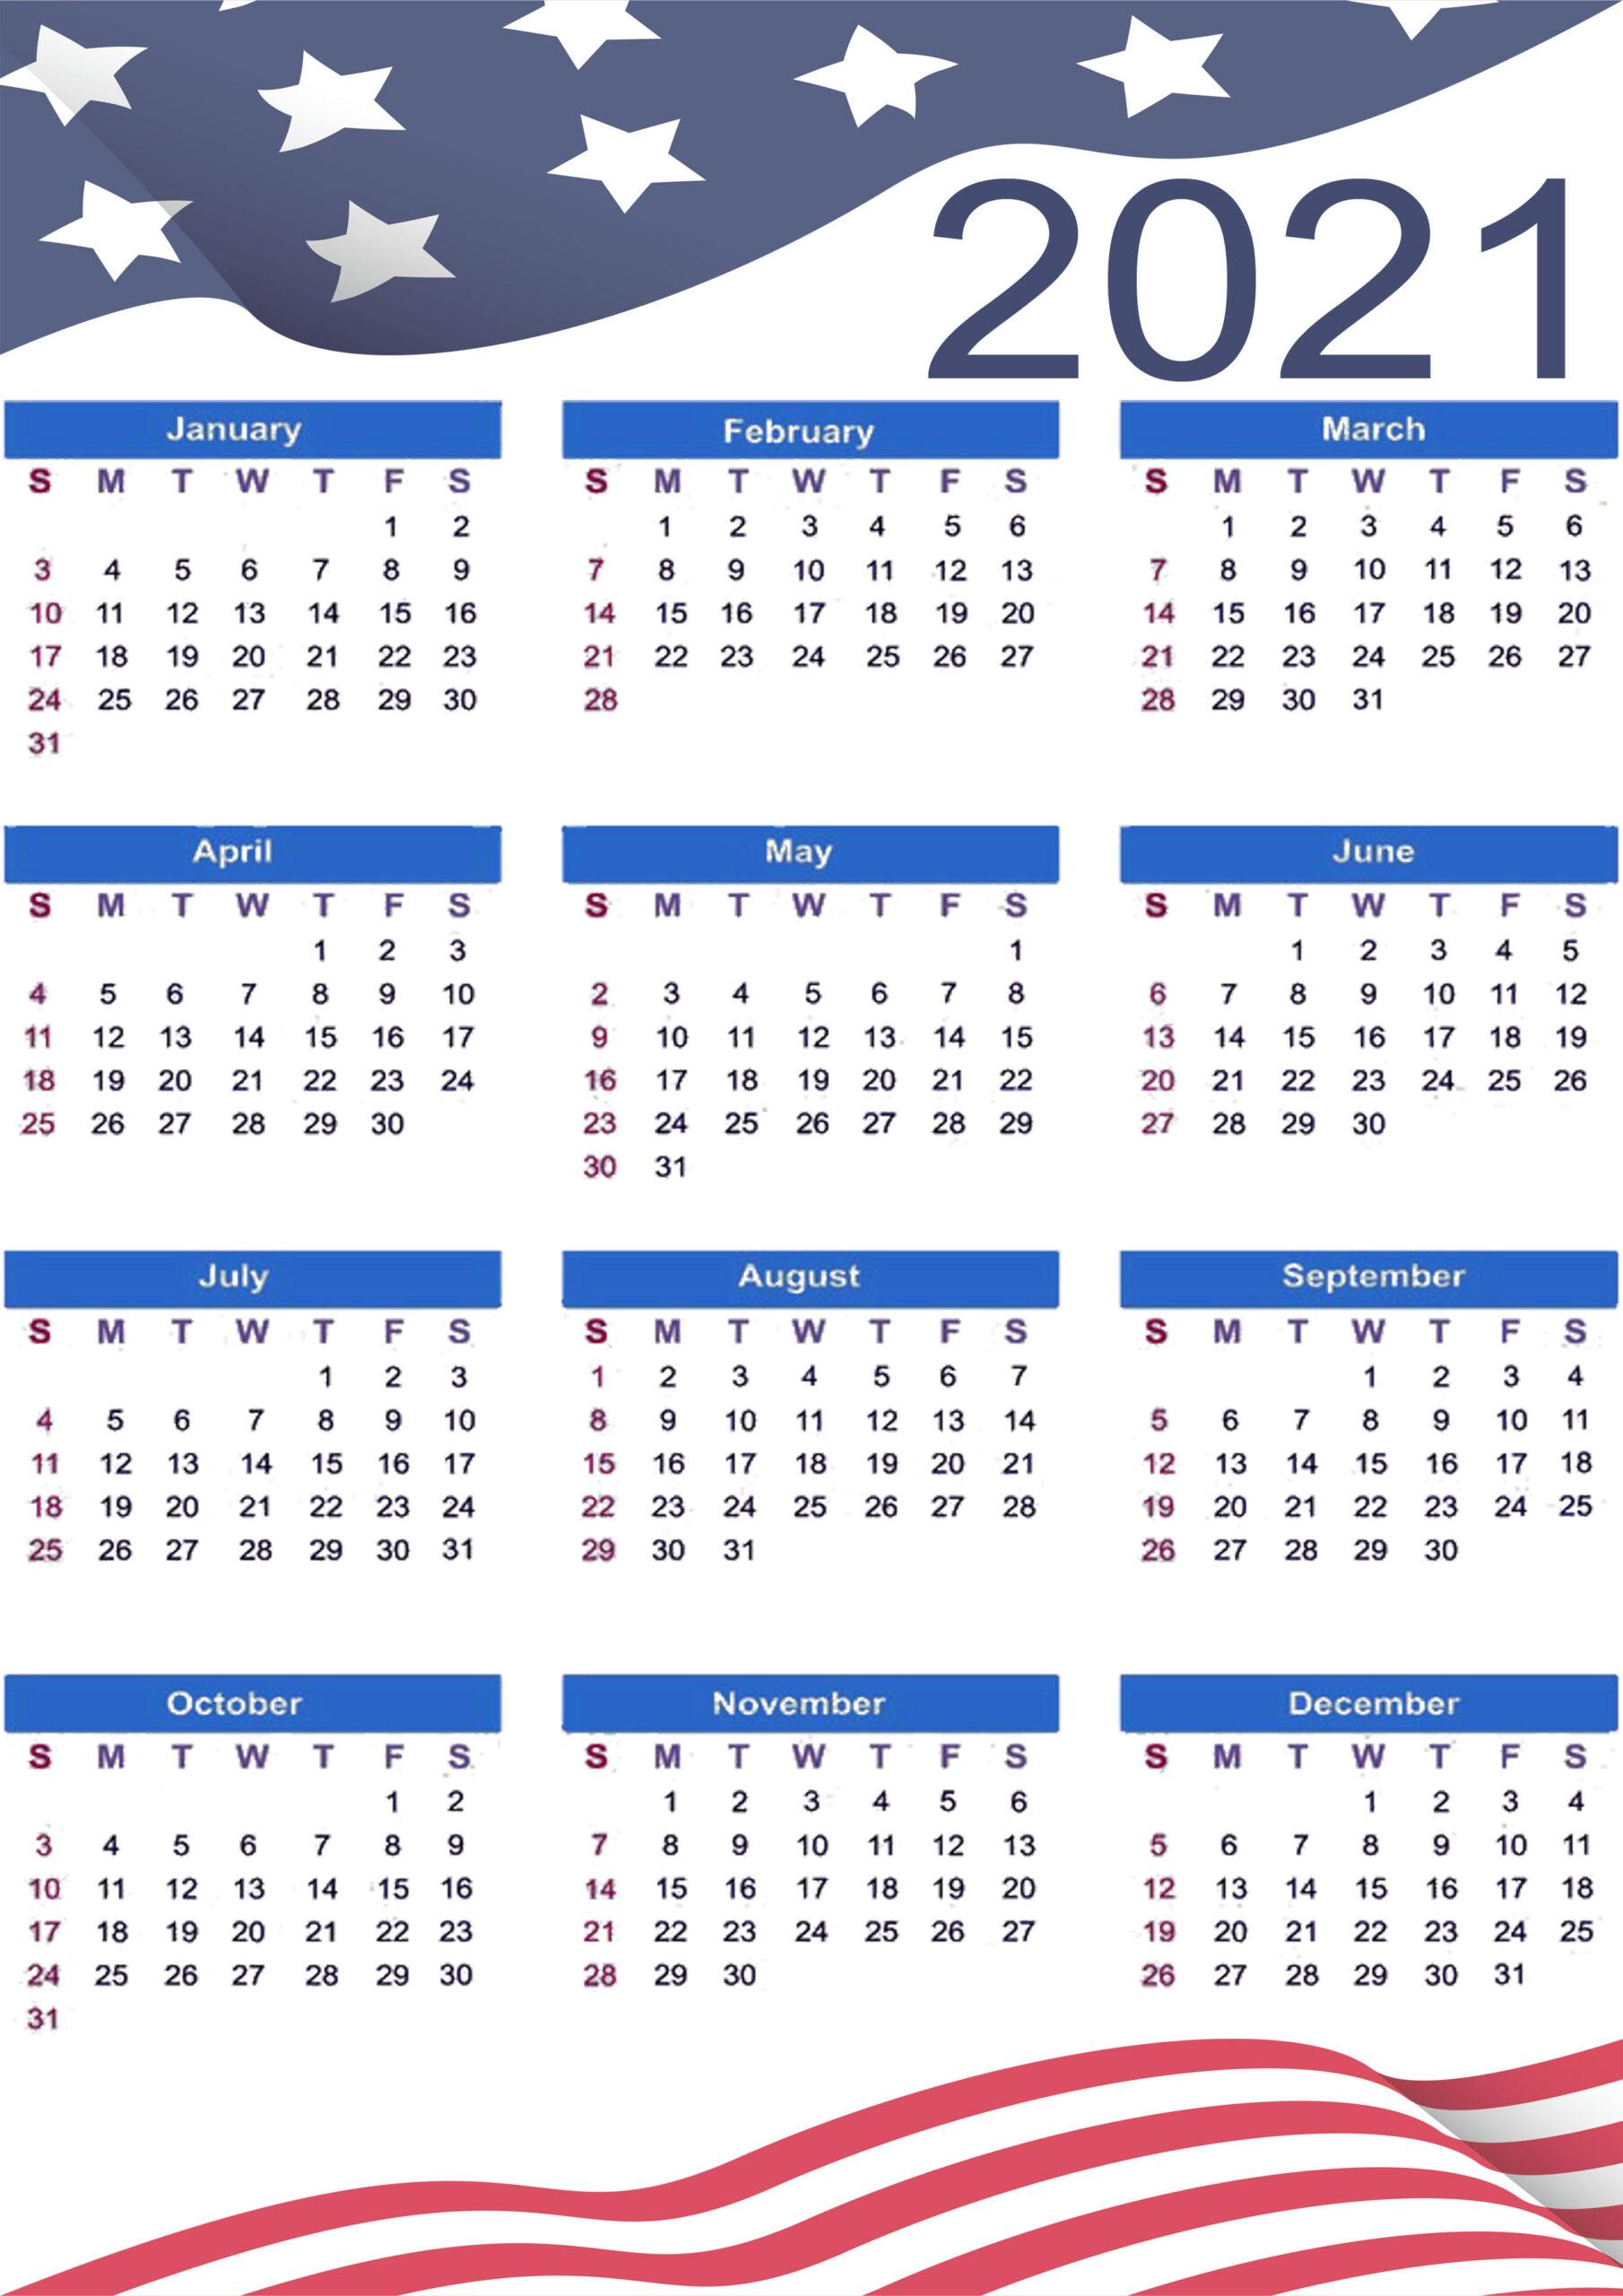 2021 Federal Holiday Calendar